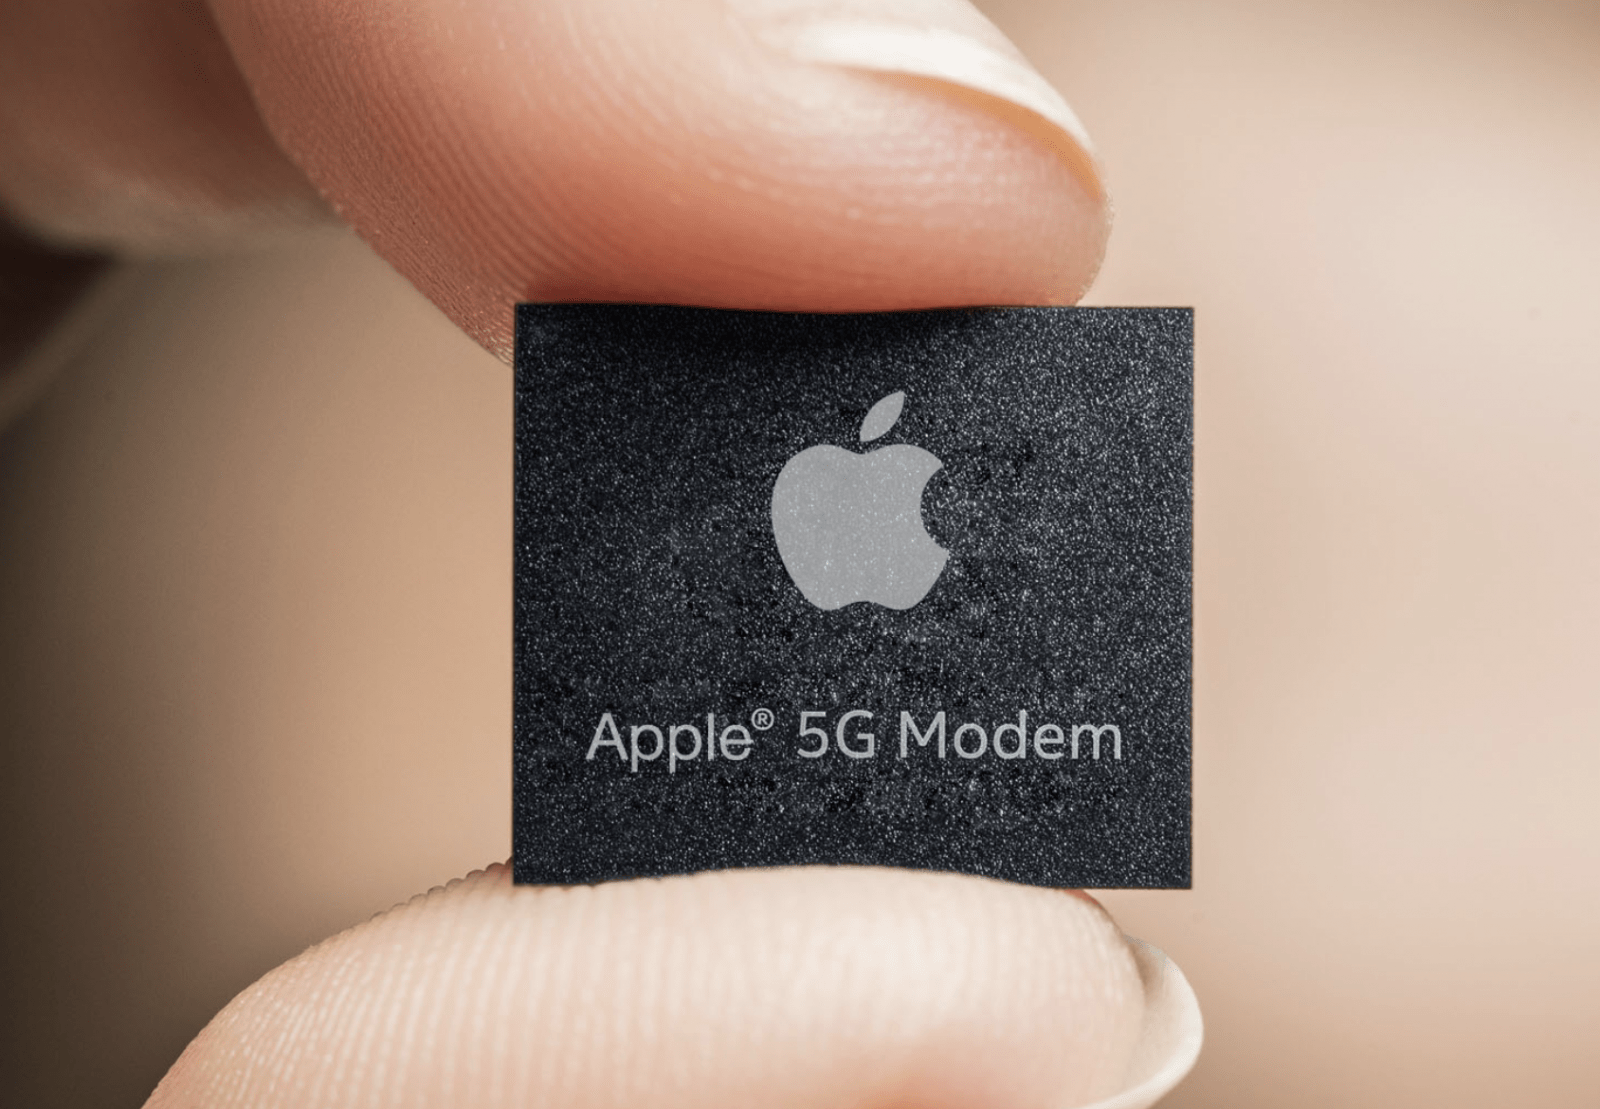 Apple избавится от модемов Qualcomm вслед за процессорами Intel (1607684183 snimok jekrana 2020 12 11 v 13 55 44)